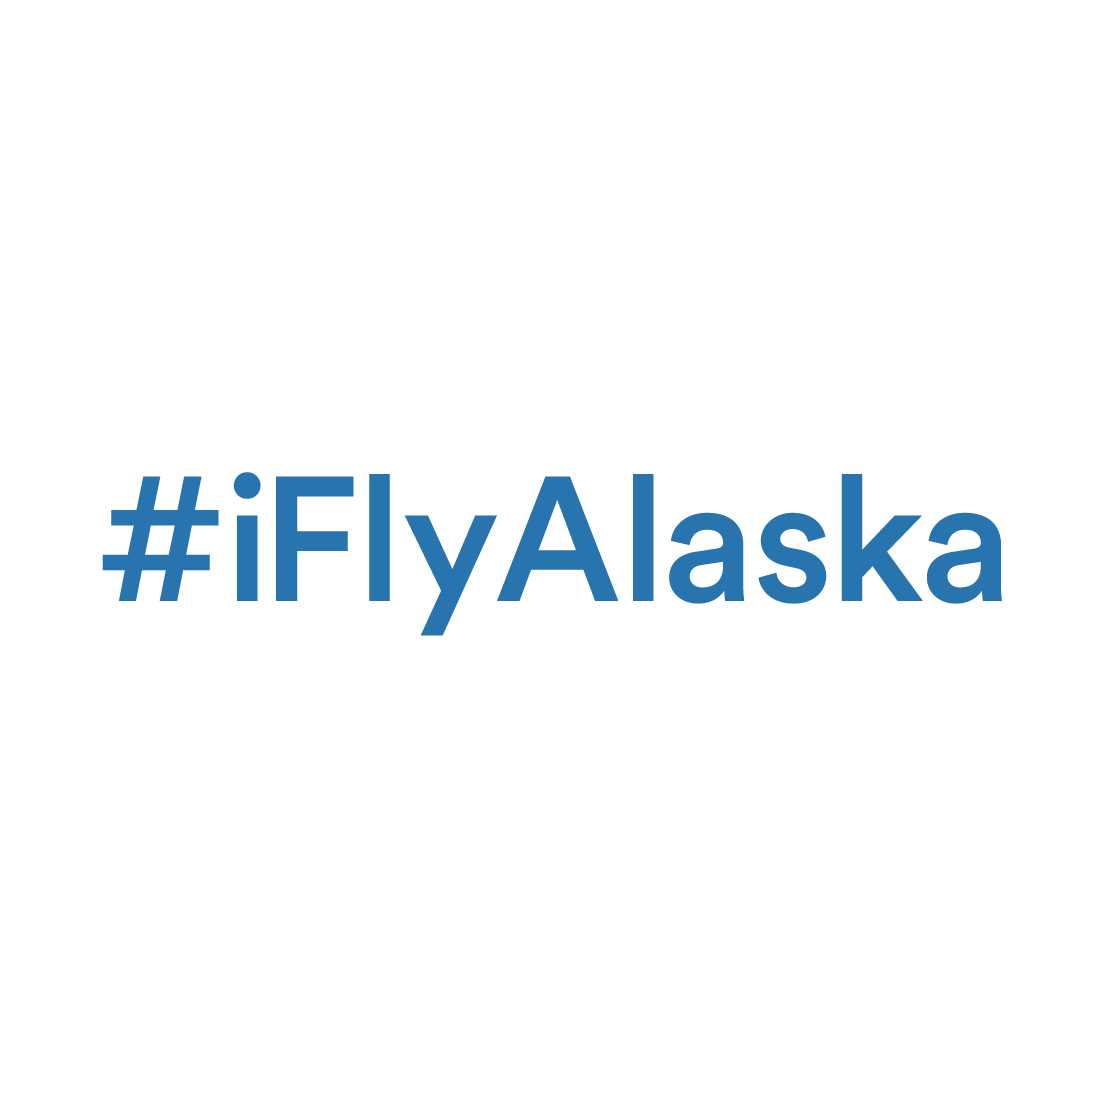 Social-Giphys_#iFlyAlaska-Atlas.png